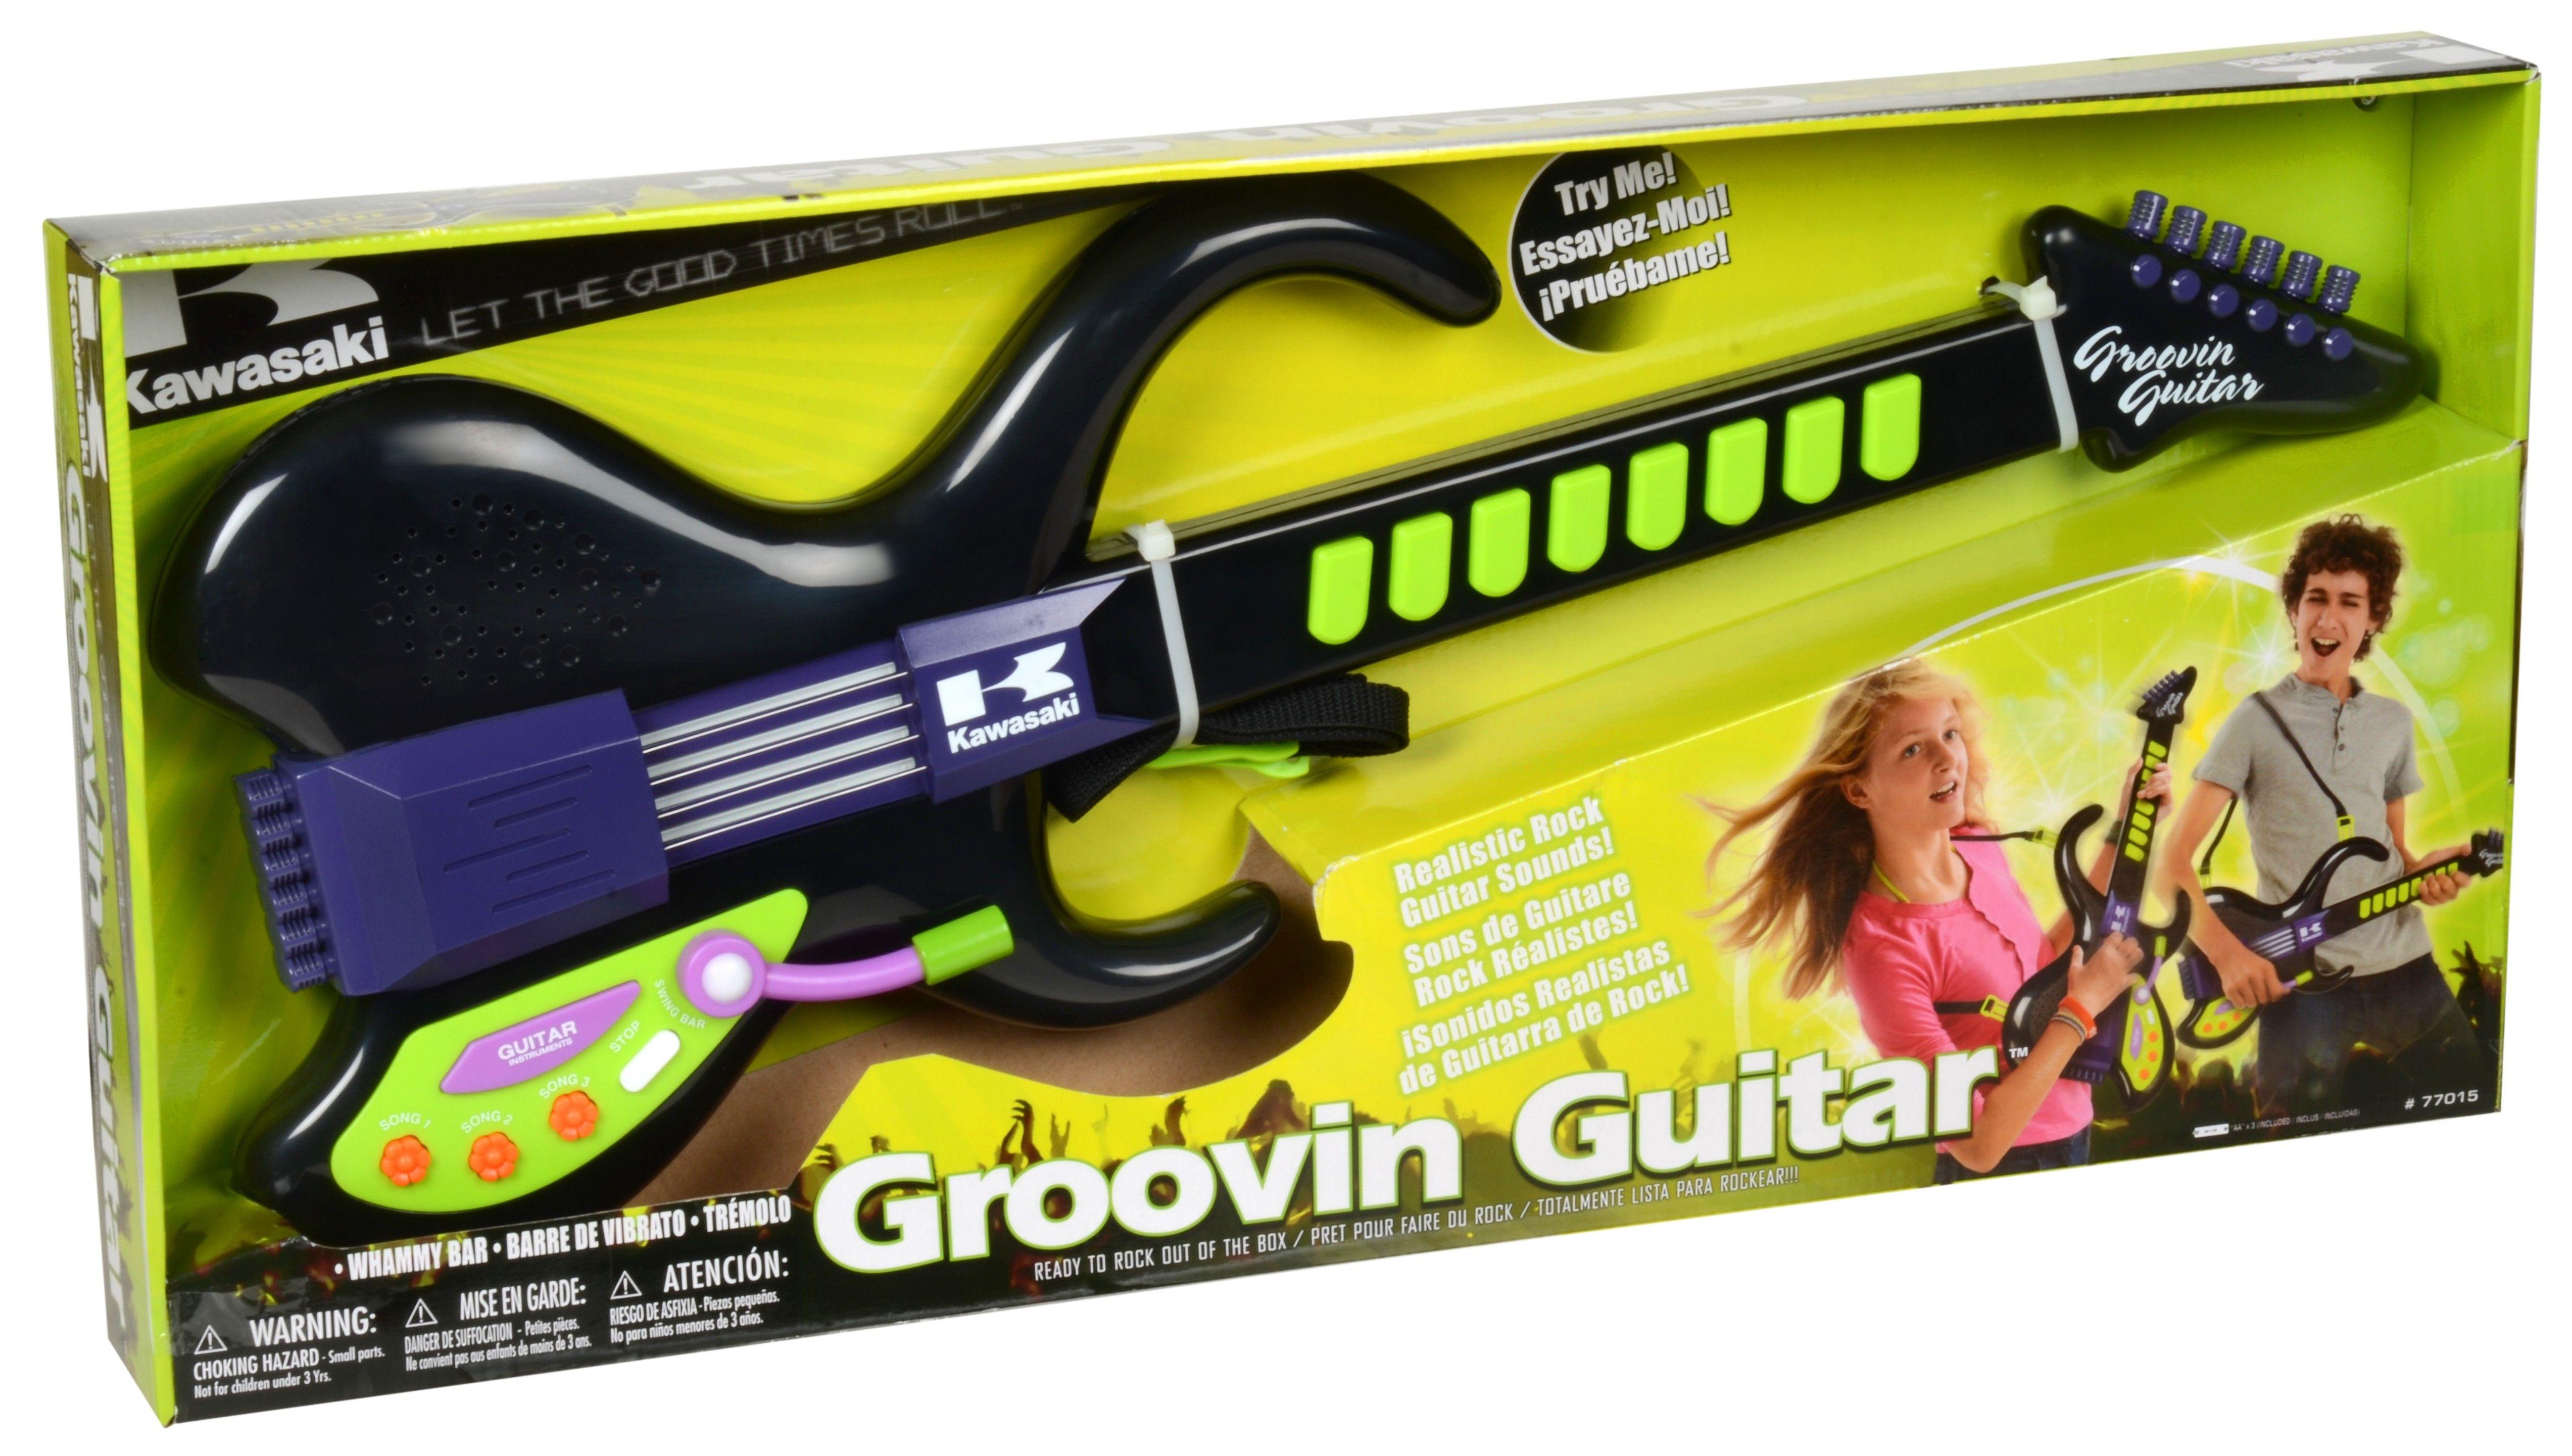 Groovin Guitar Kawasaki Guitars Pinterest Guitar